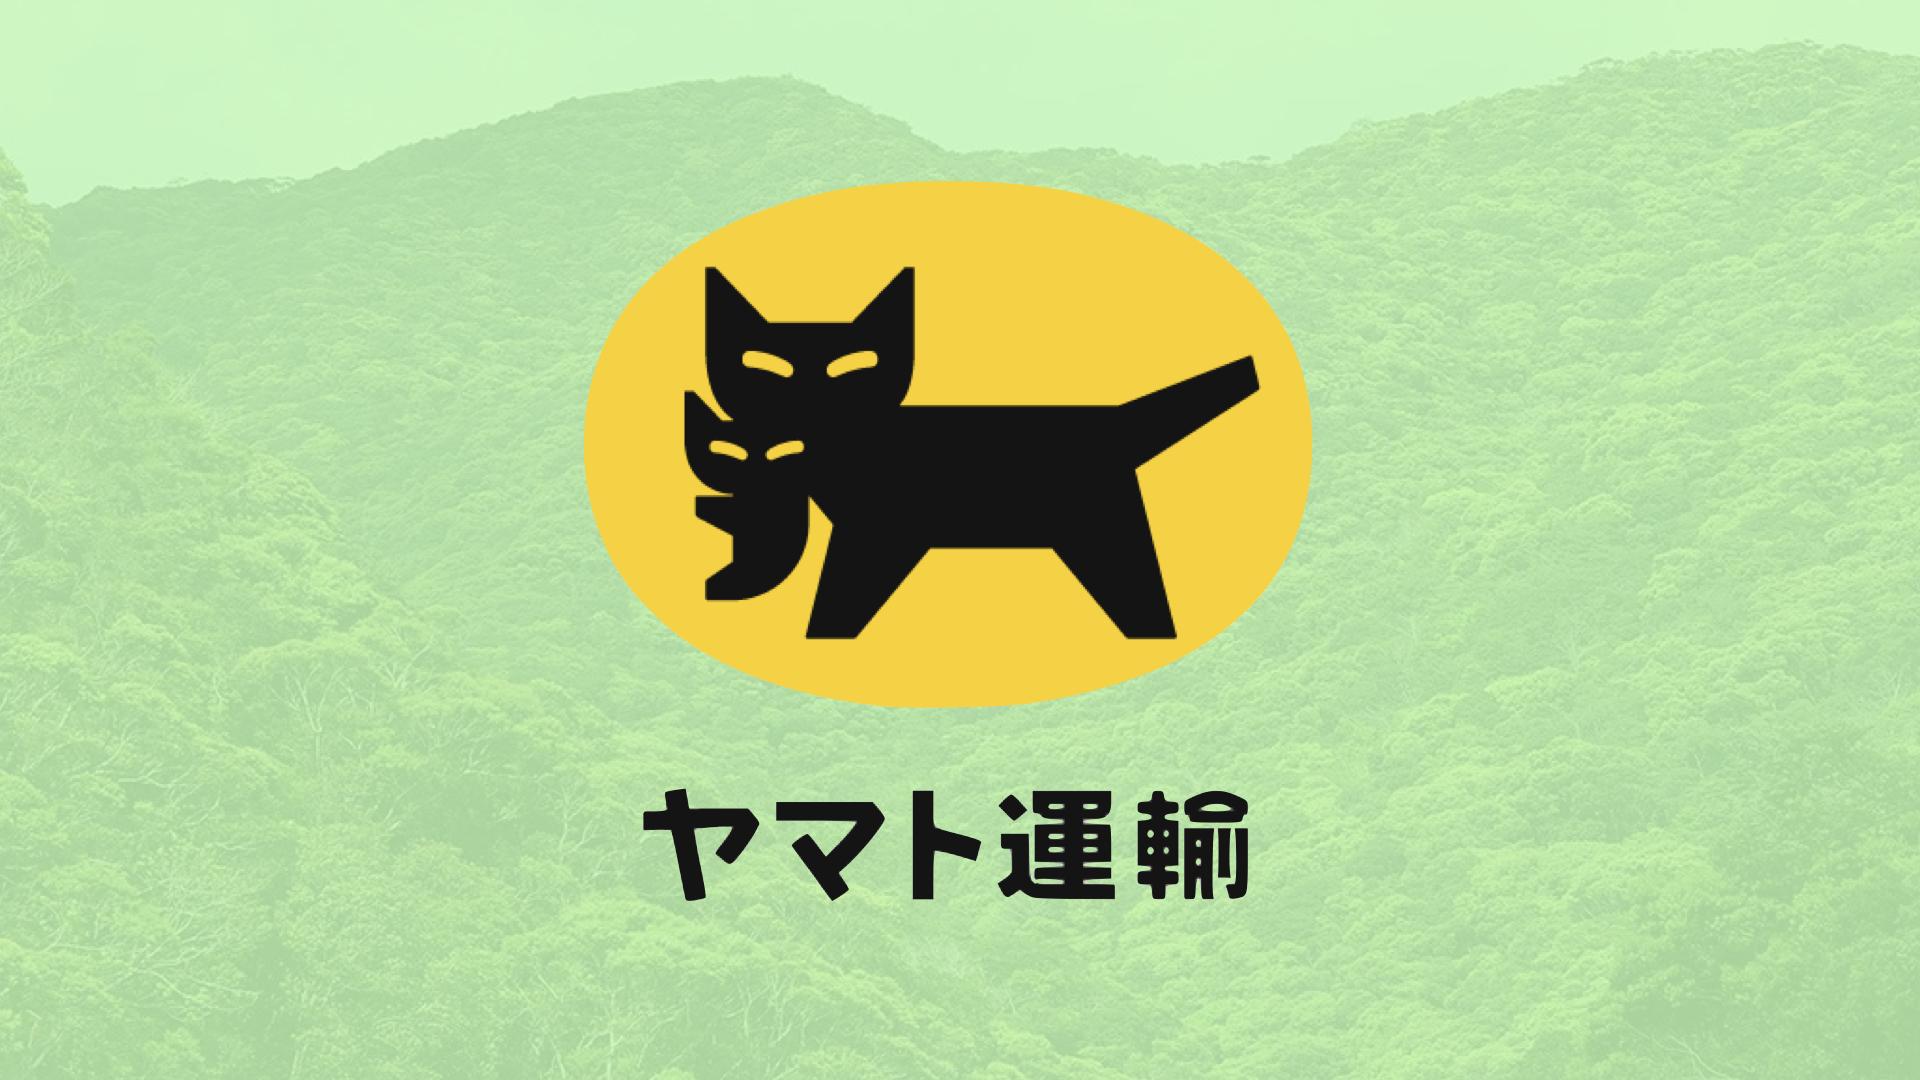 akihabaranews.com - Yamato Explores Drug Delivery by Drone - Akihabara News